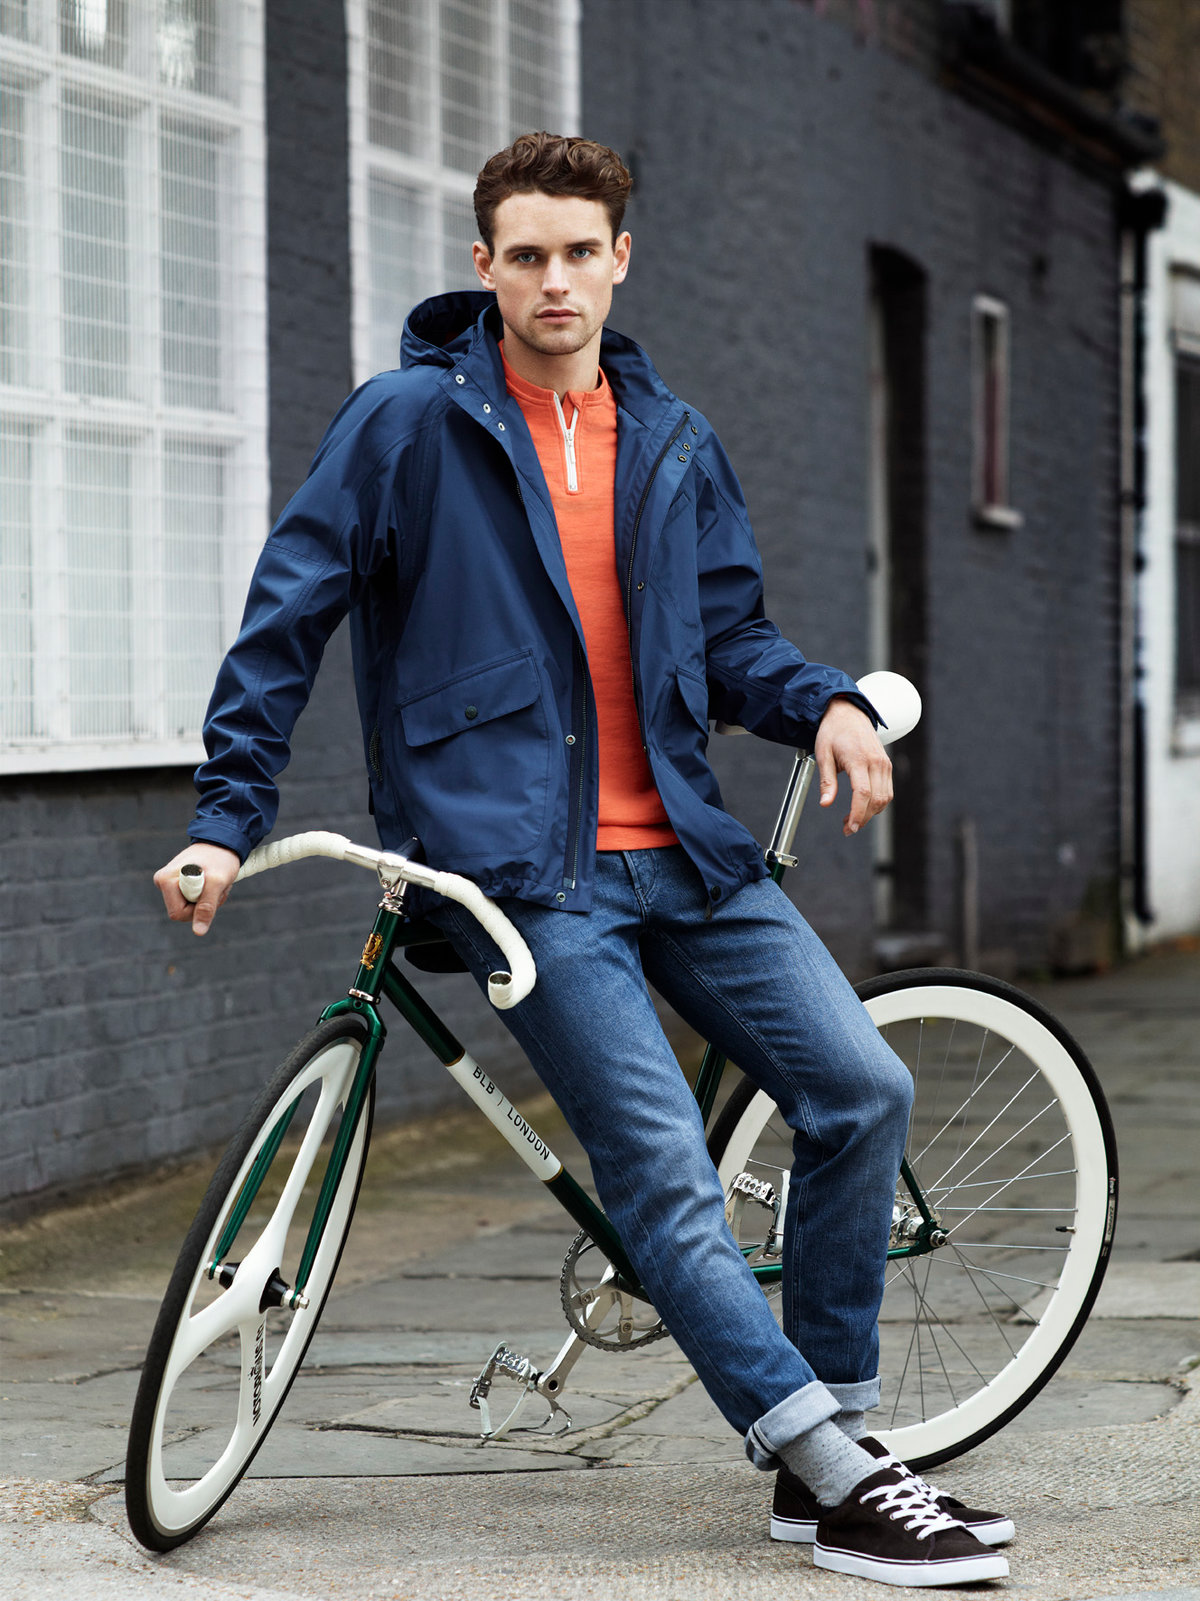 Фото мужчина на велосипеде